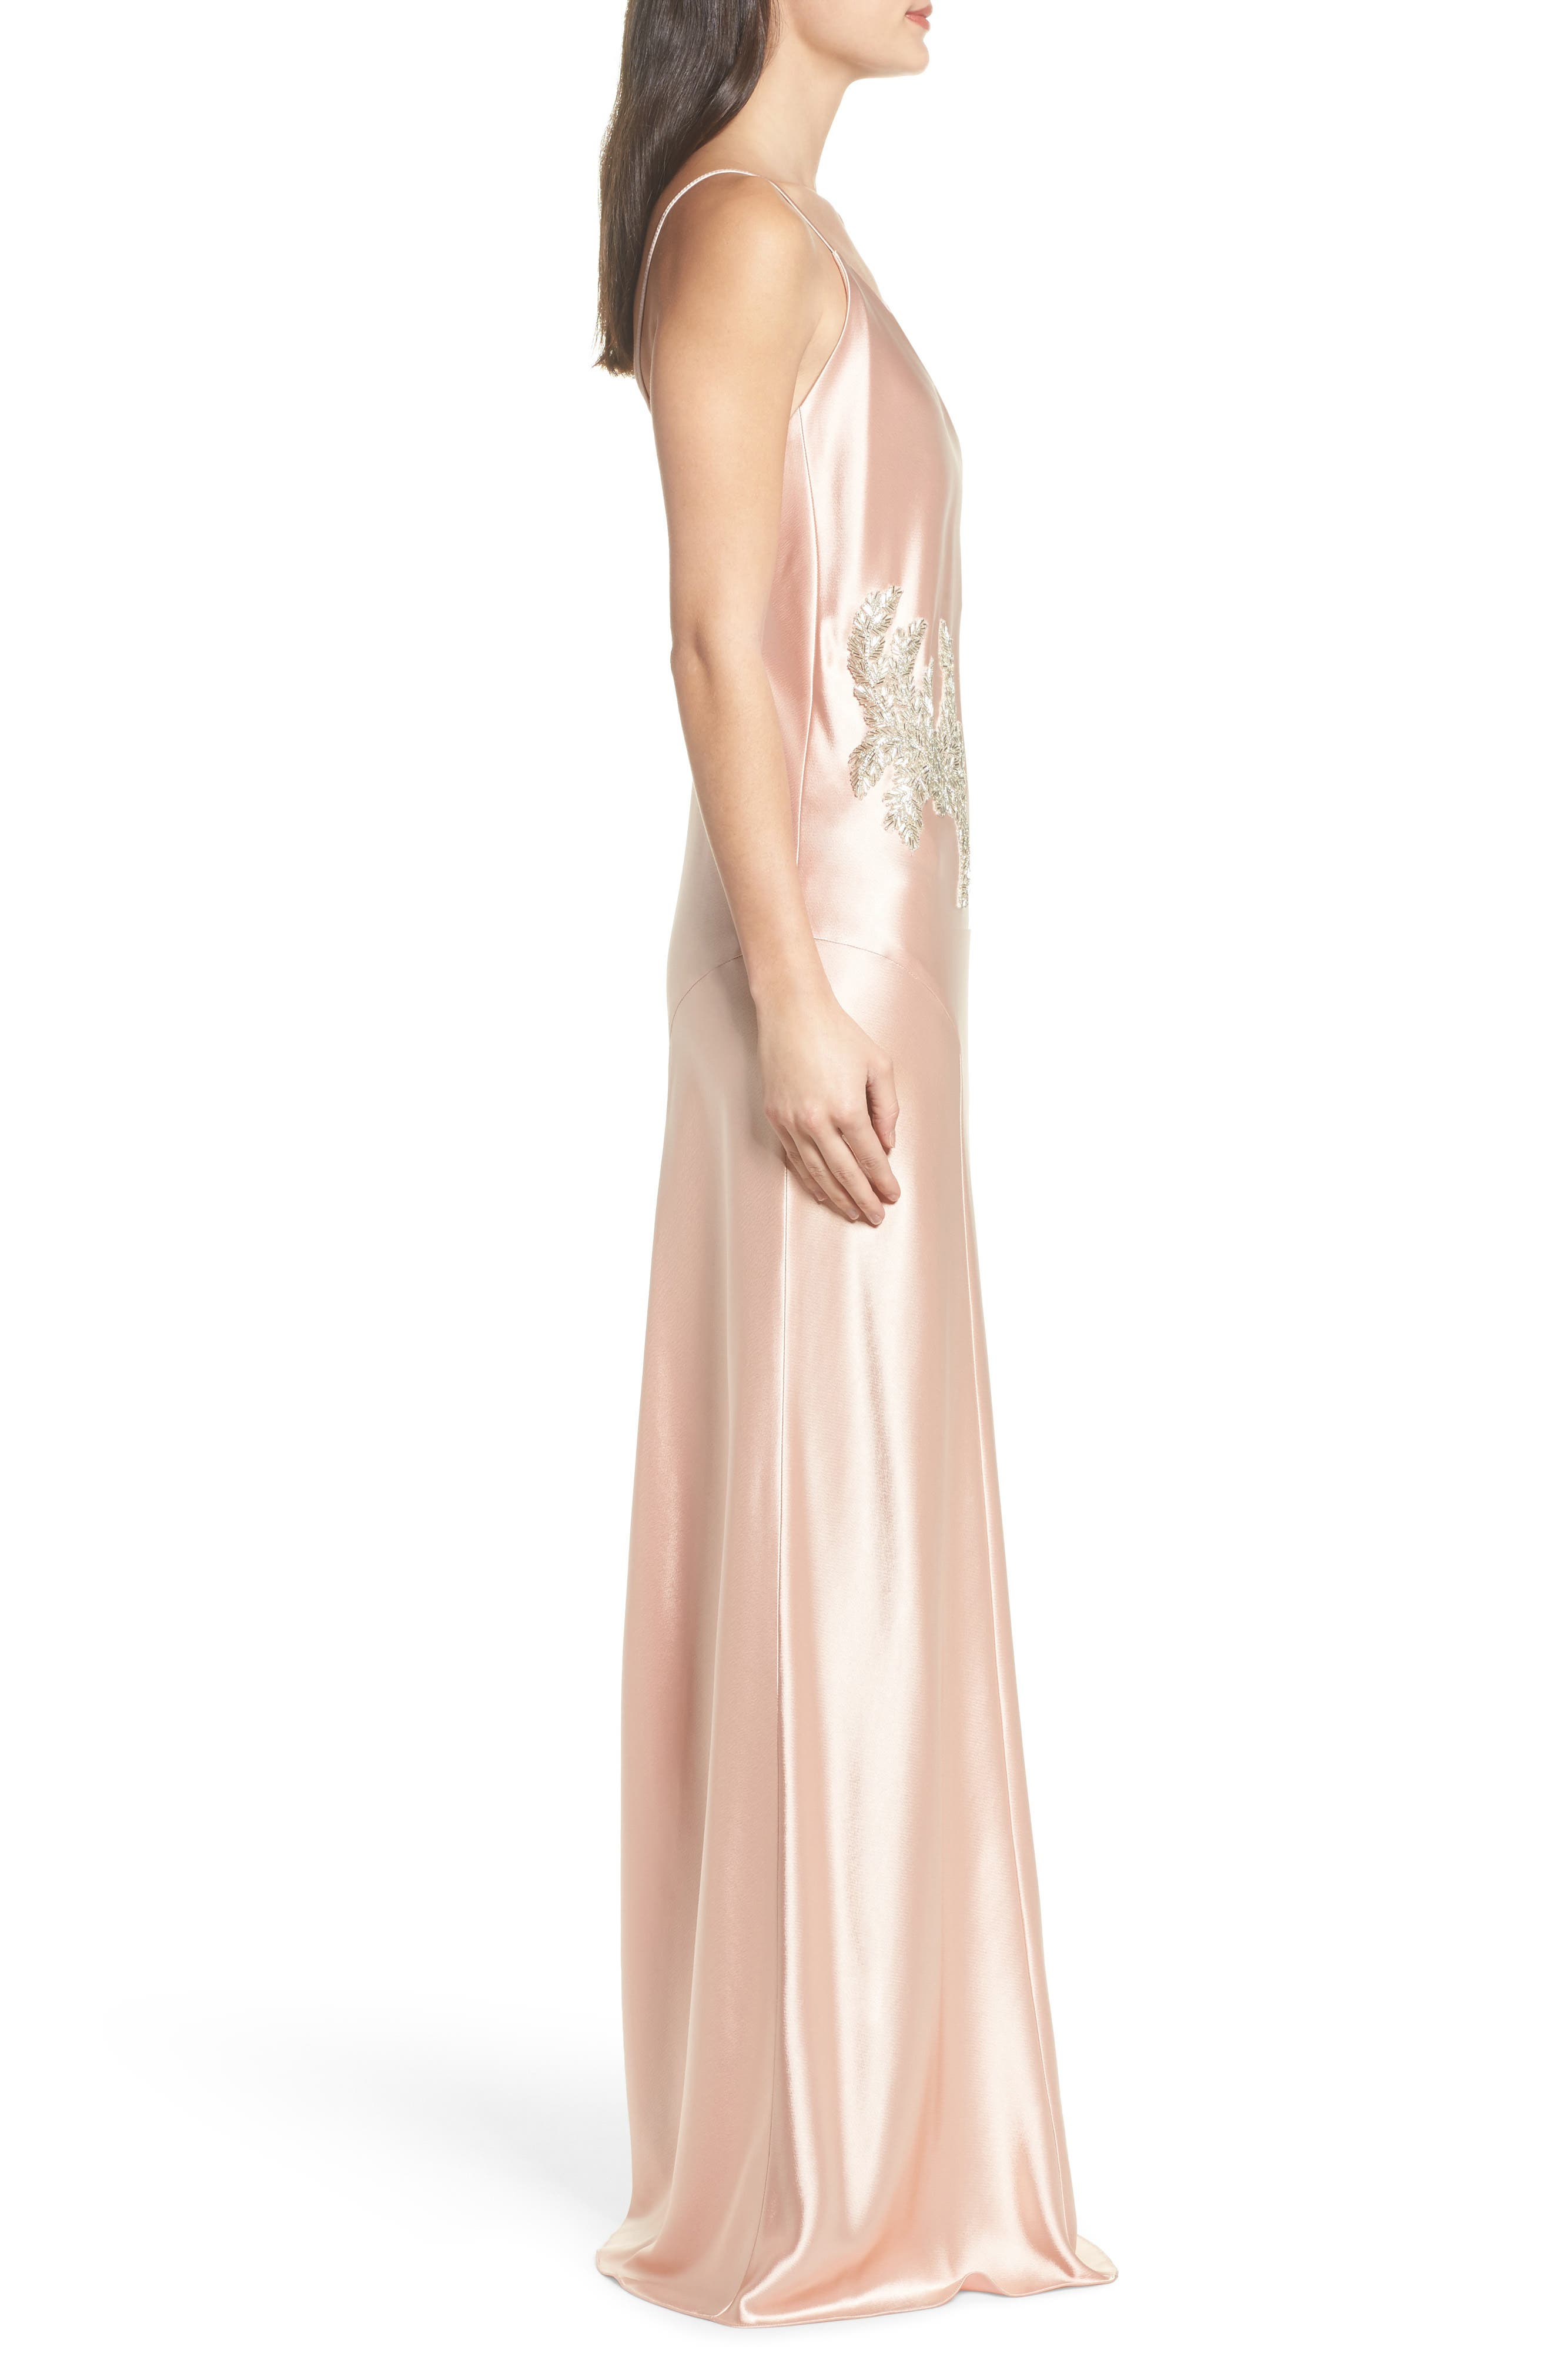 Carmen Embellished Satin Slip Gown,                             Alternate thumbnail 3, color,                             691